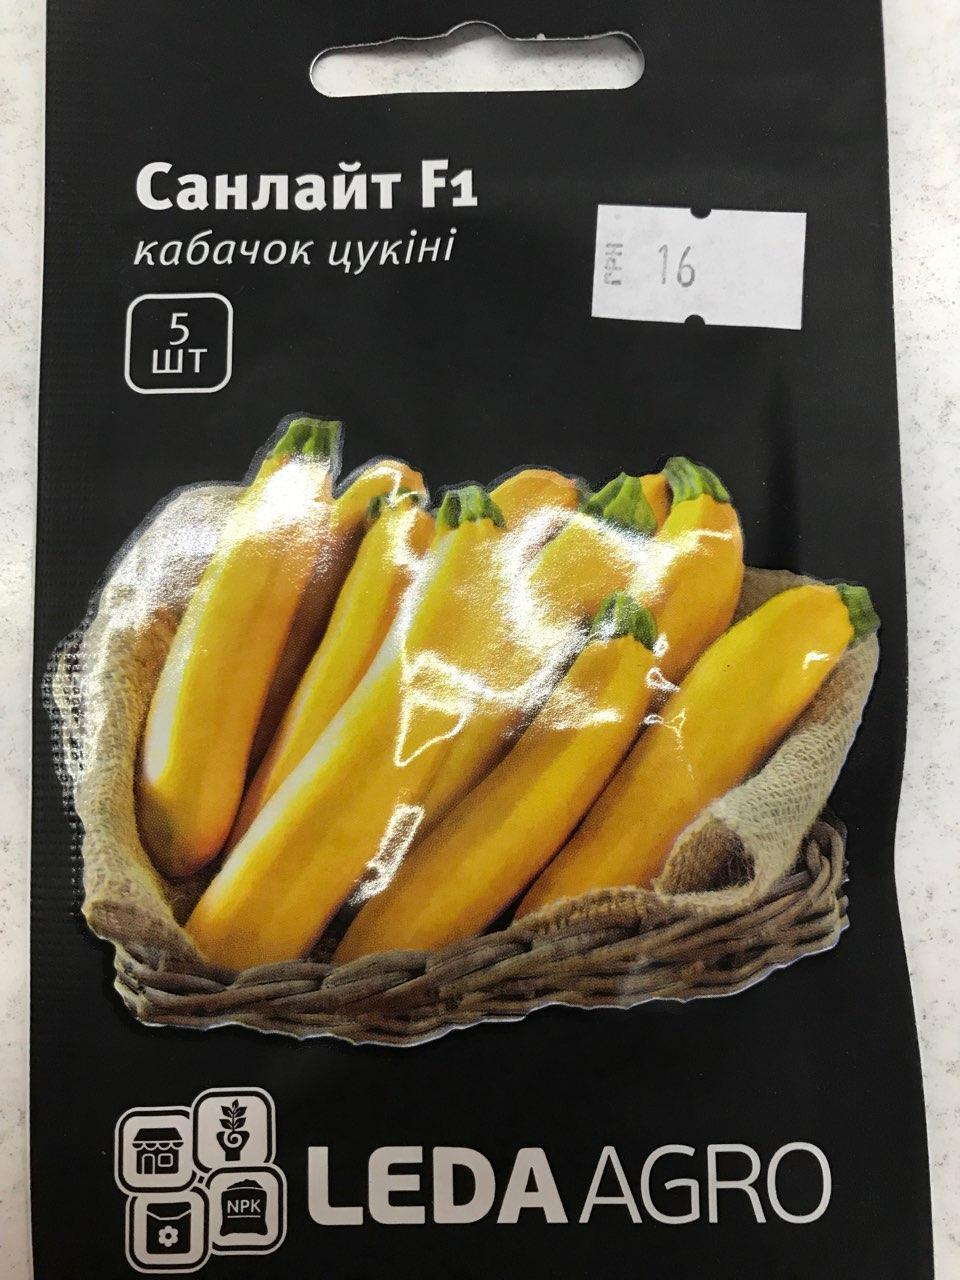 Семена кабачка Санлайт F1 5 шт